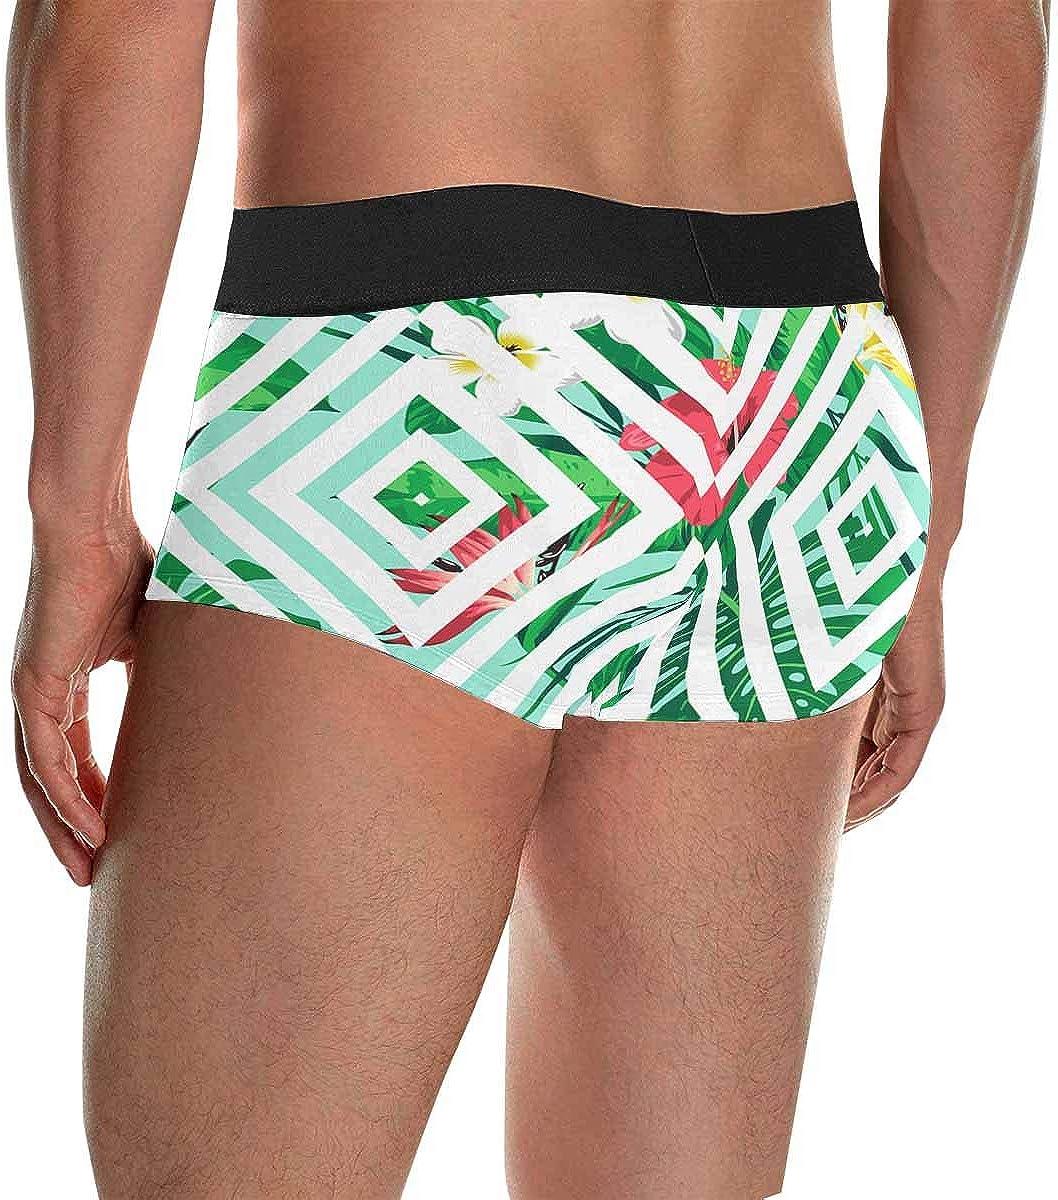 XS-4XL INTERESTPRINT Mens Boxer Briefs Underwear Pants